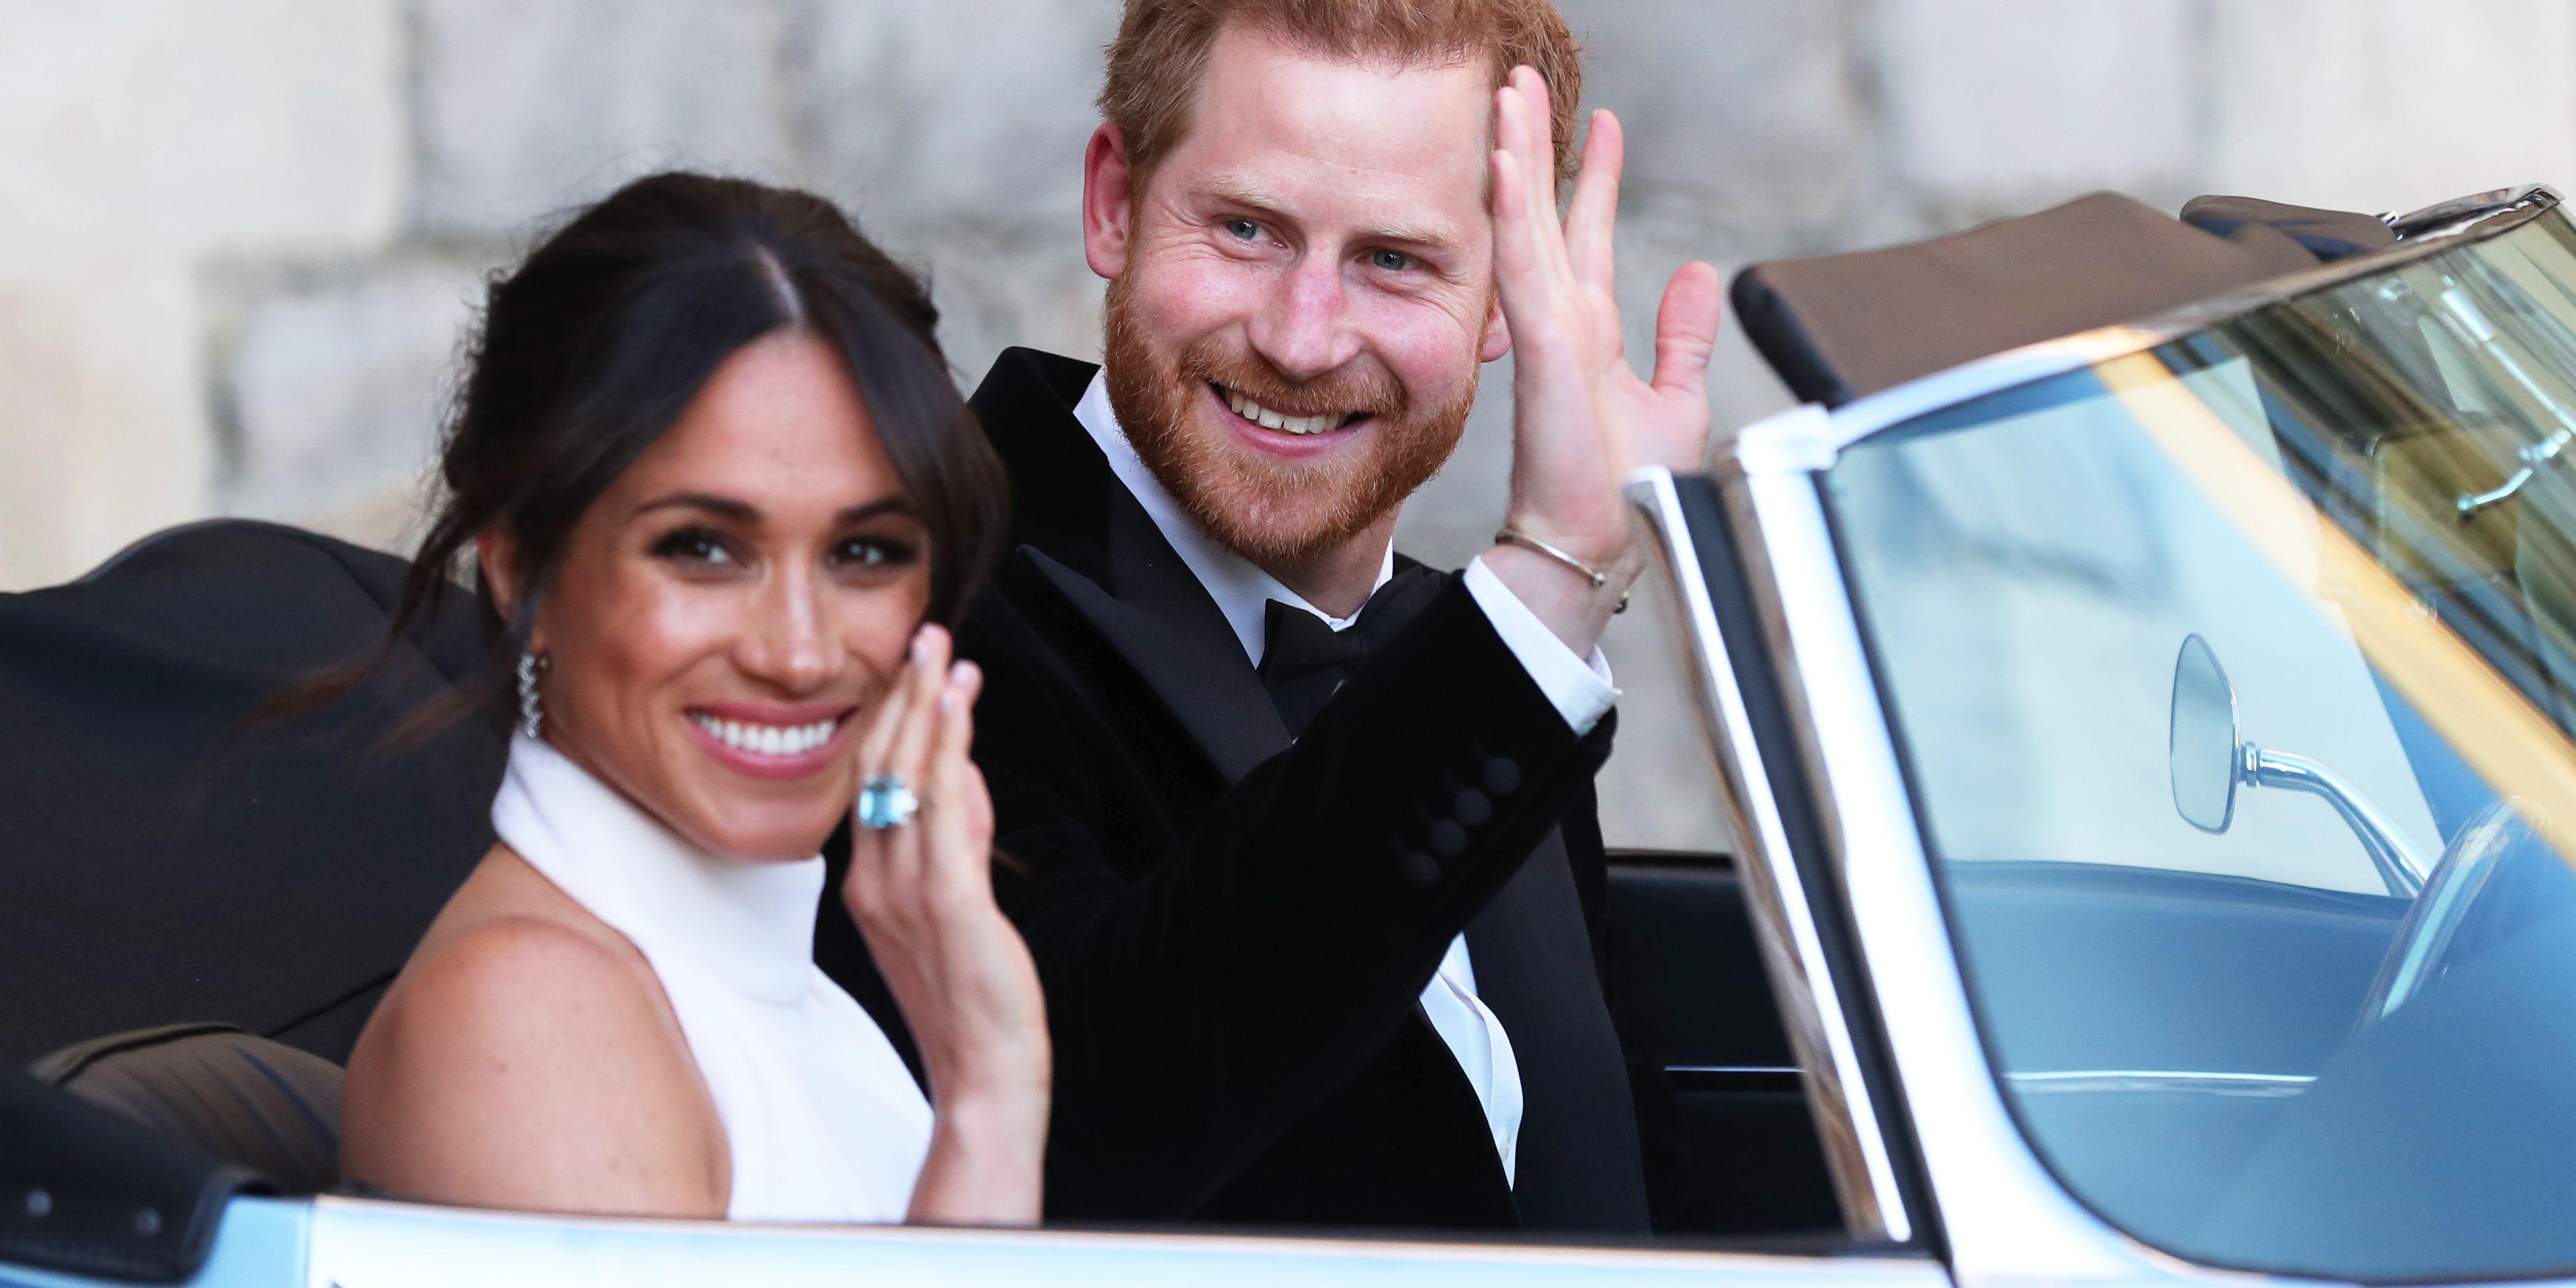 Royal Wedding prince harry meghan markle car